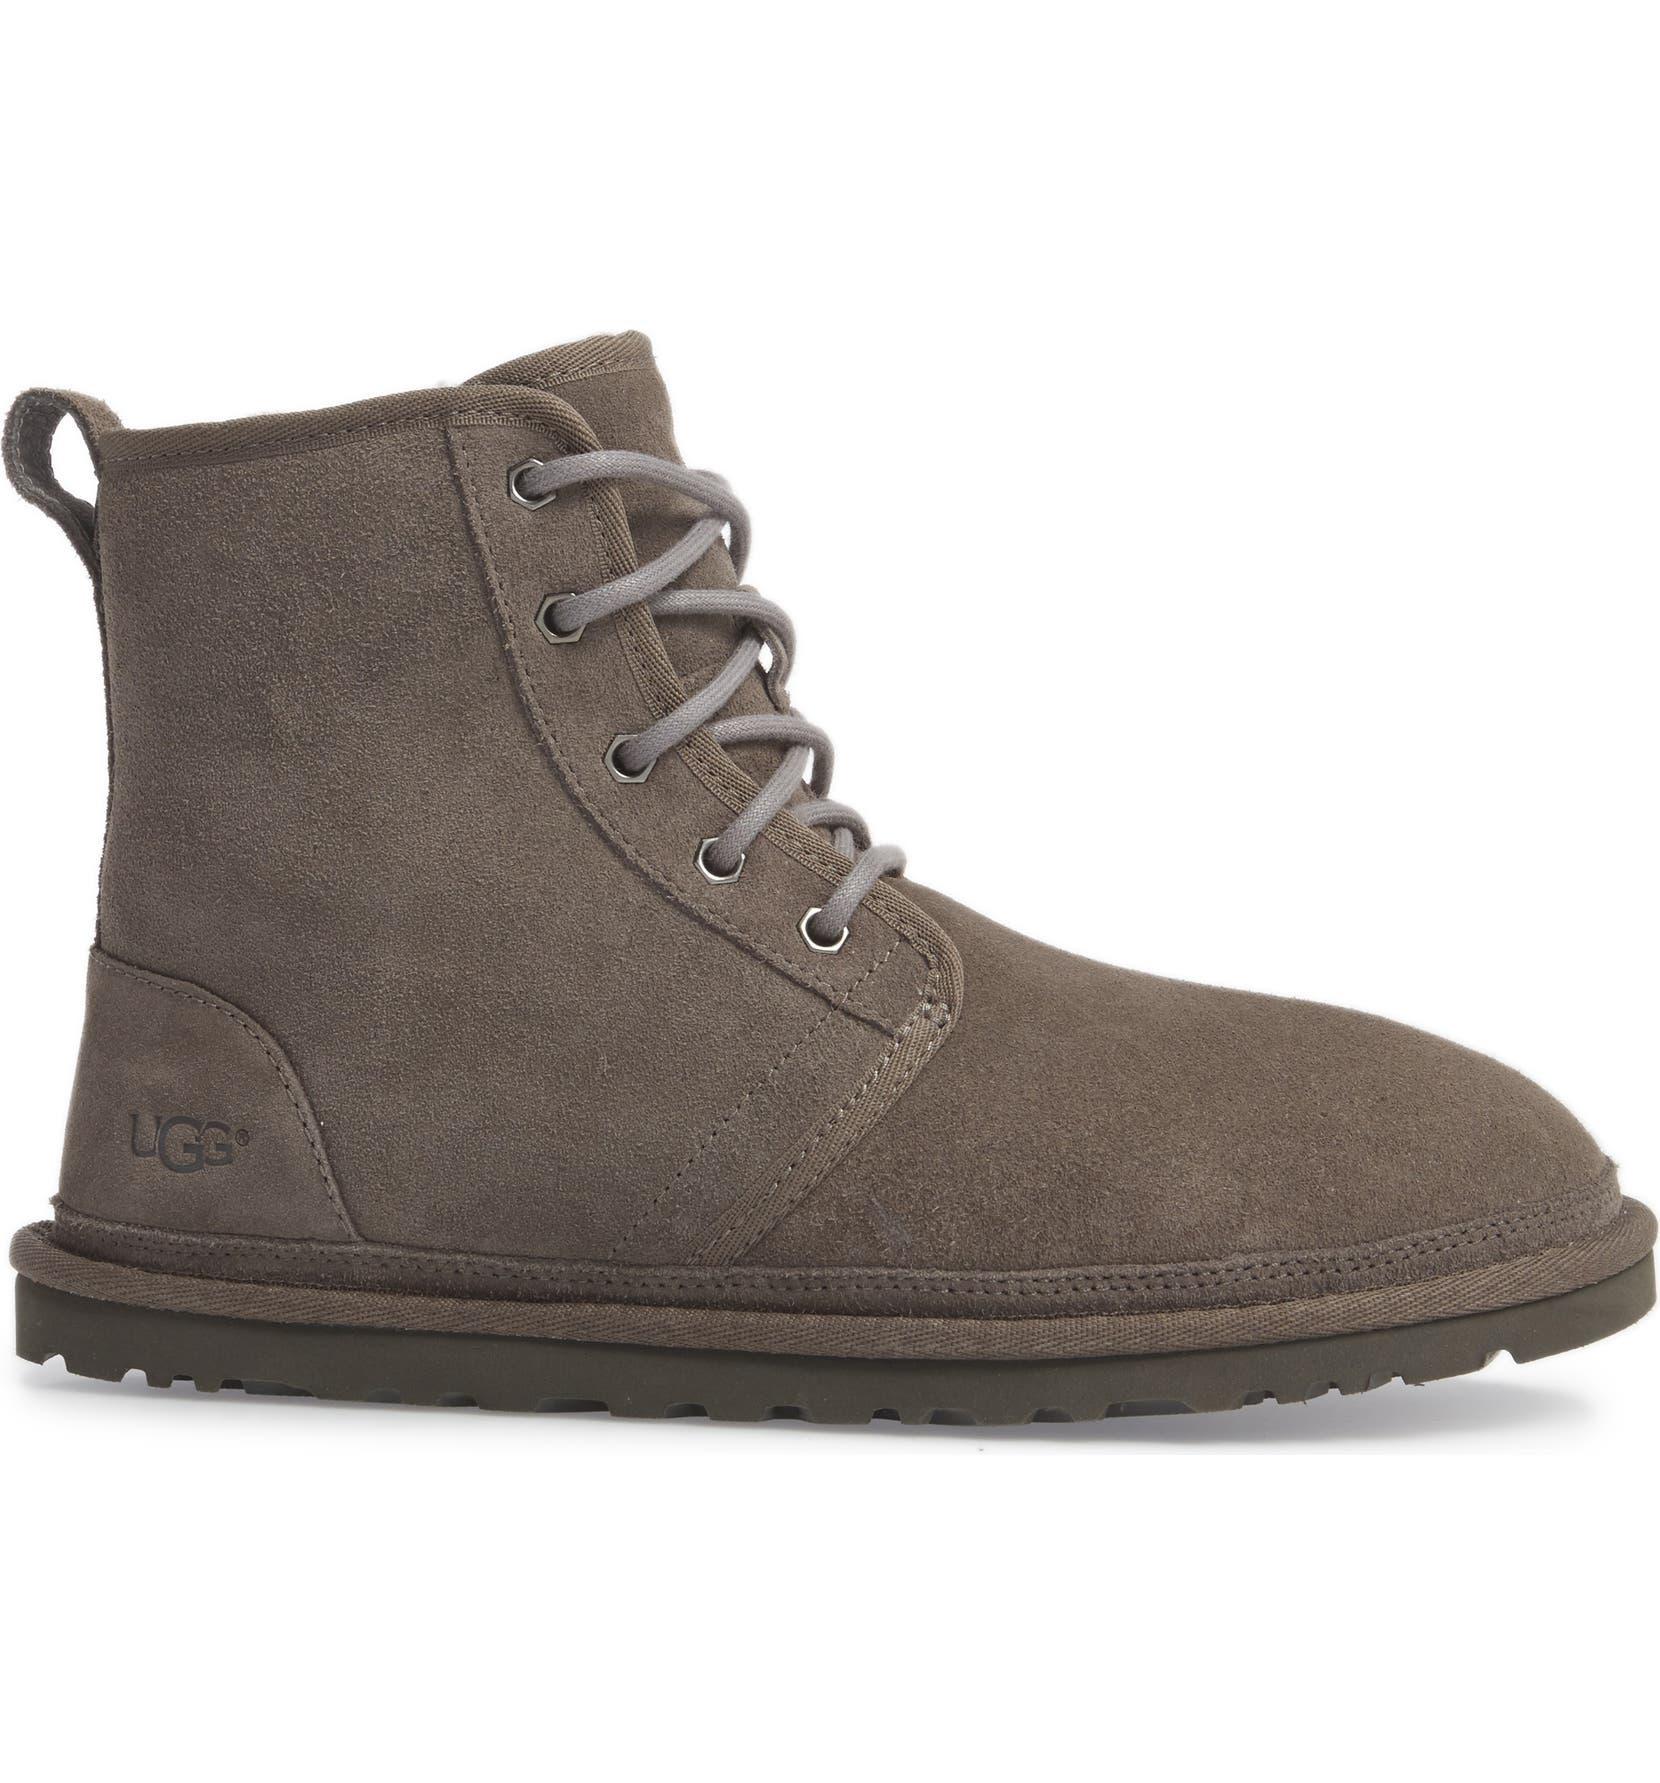 3e6e490ec86 Harkley Lace-Up Boot